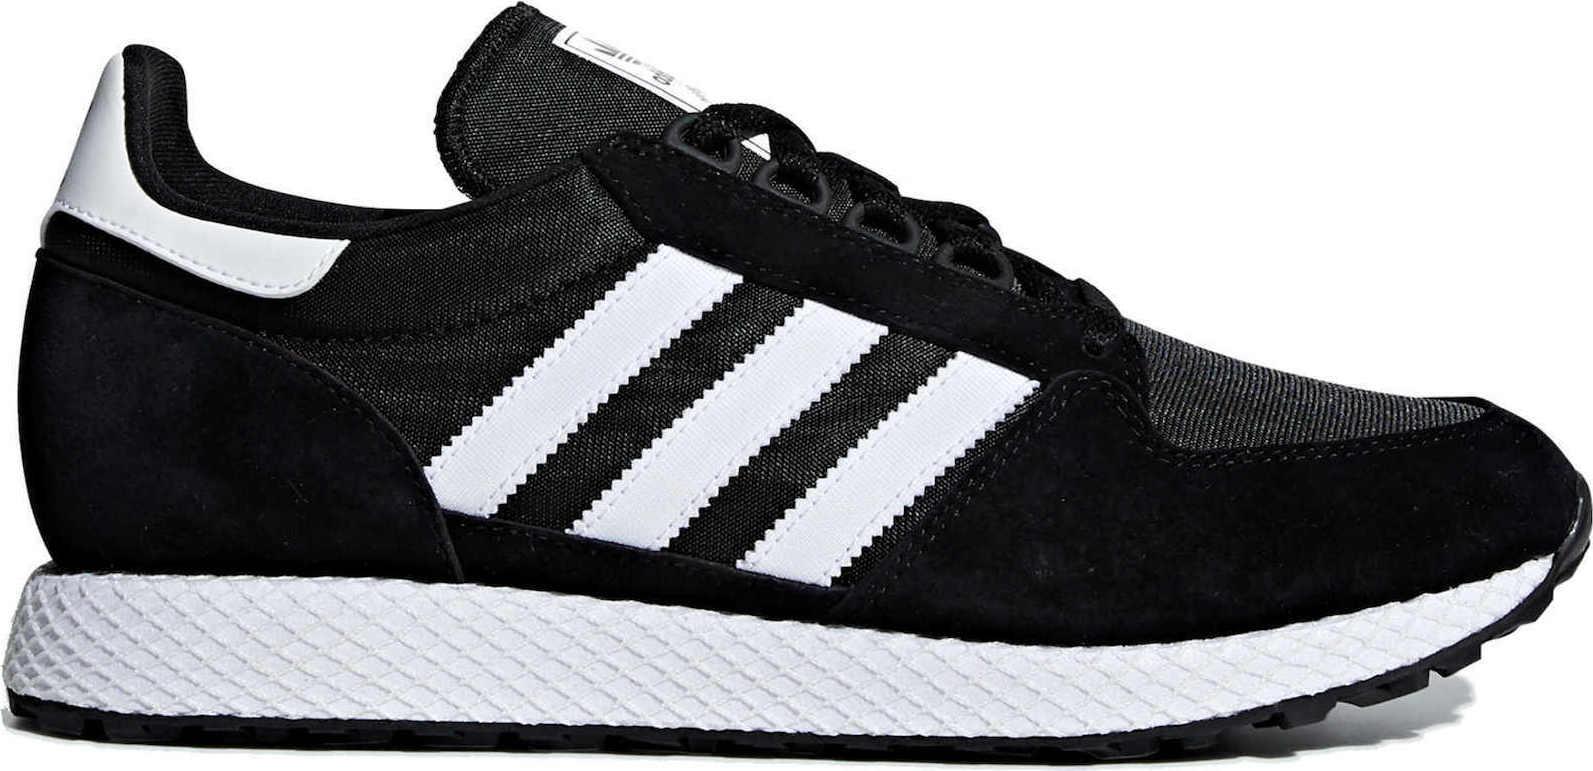 best sneakers a29cc 12c64 Προσθήκη στα αγαπημένα menu Adidas Forest Grove B41550